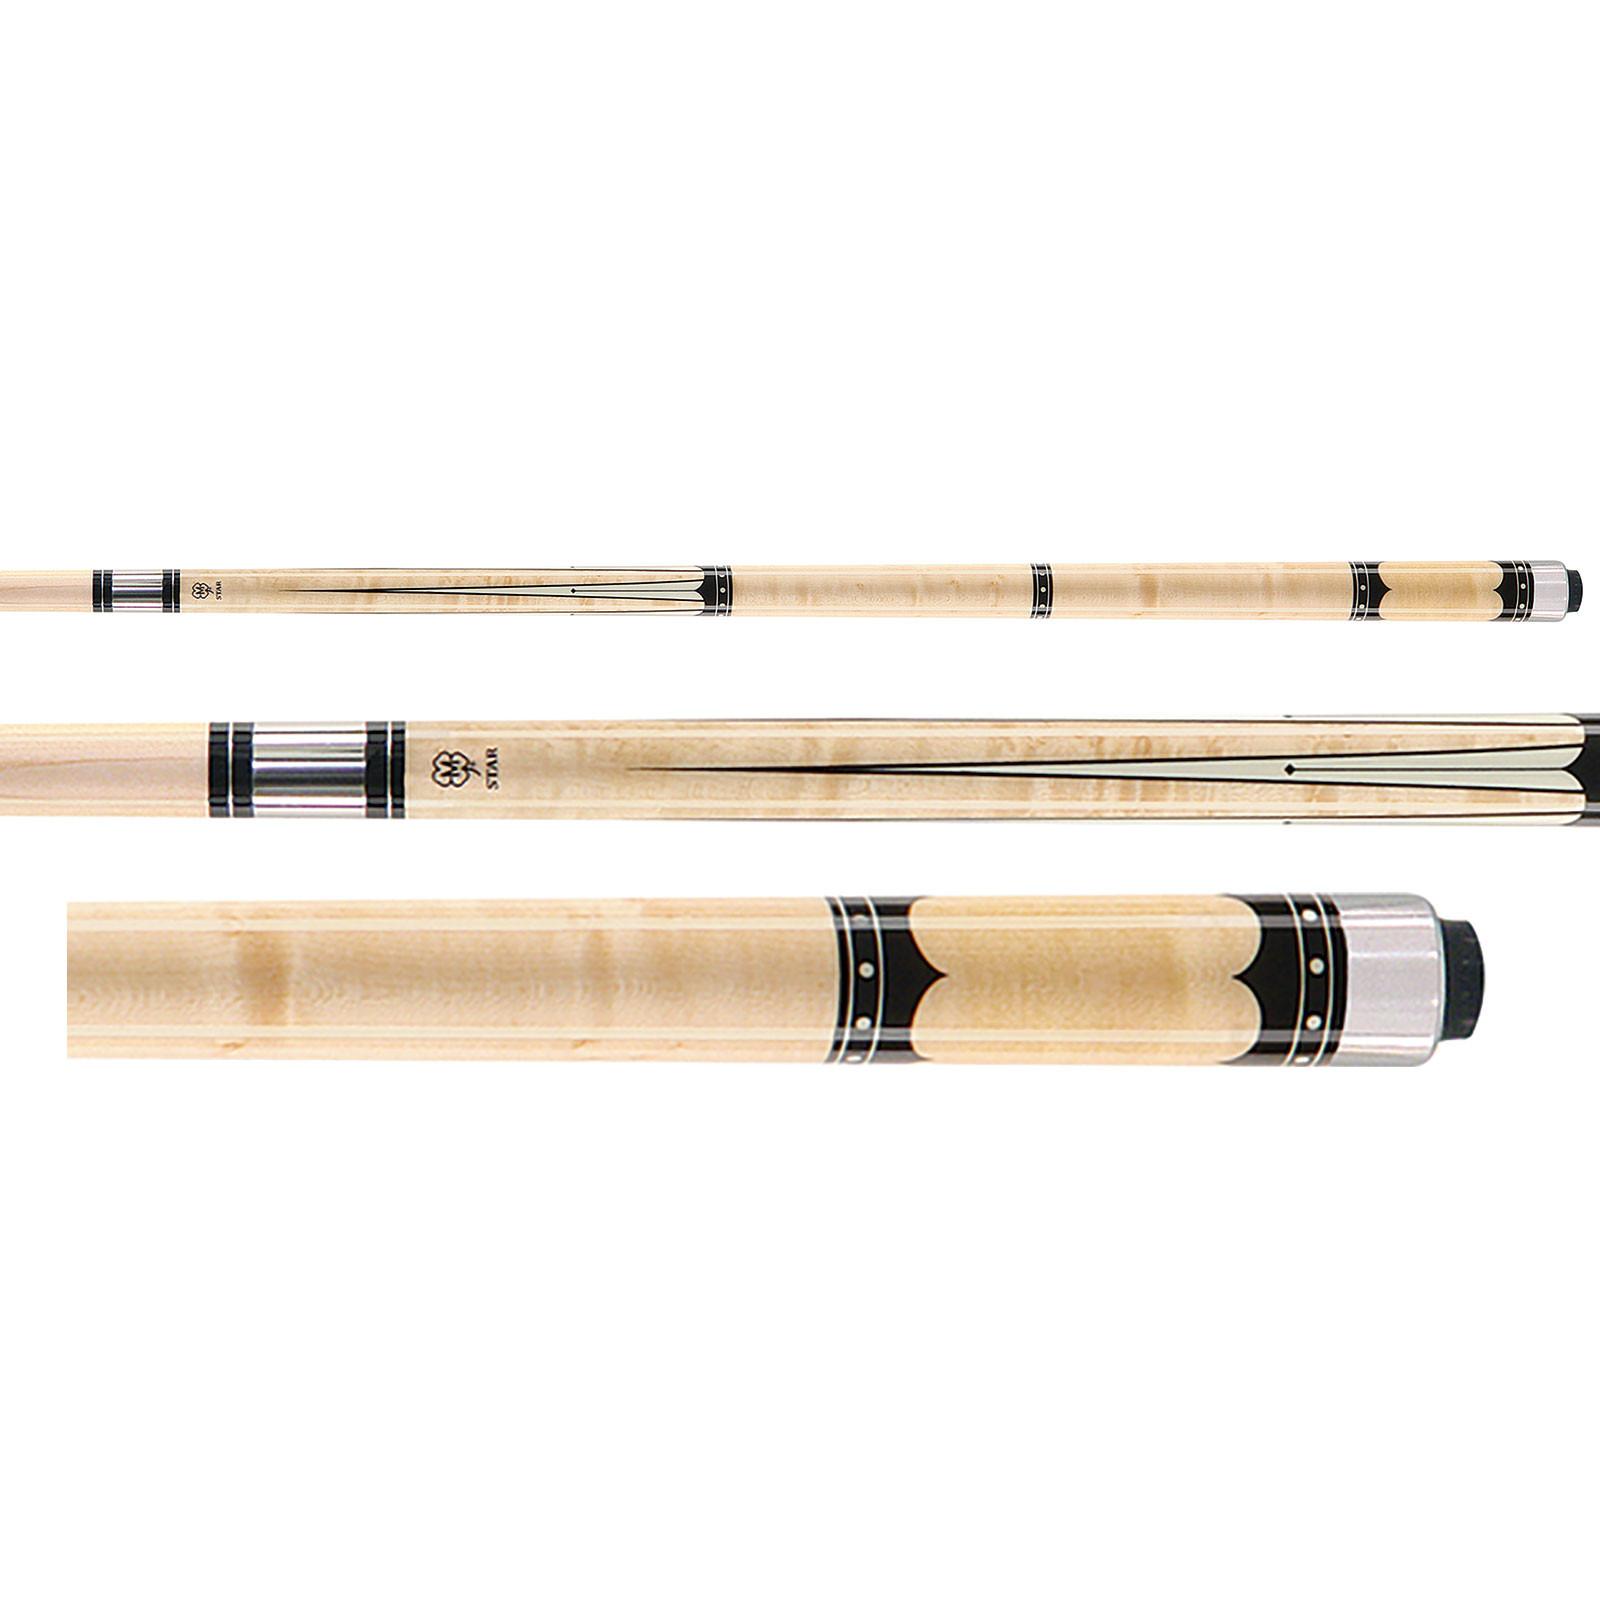 McDermott Star S58 Natural Billiards Pool Cue Stick